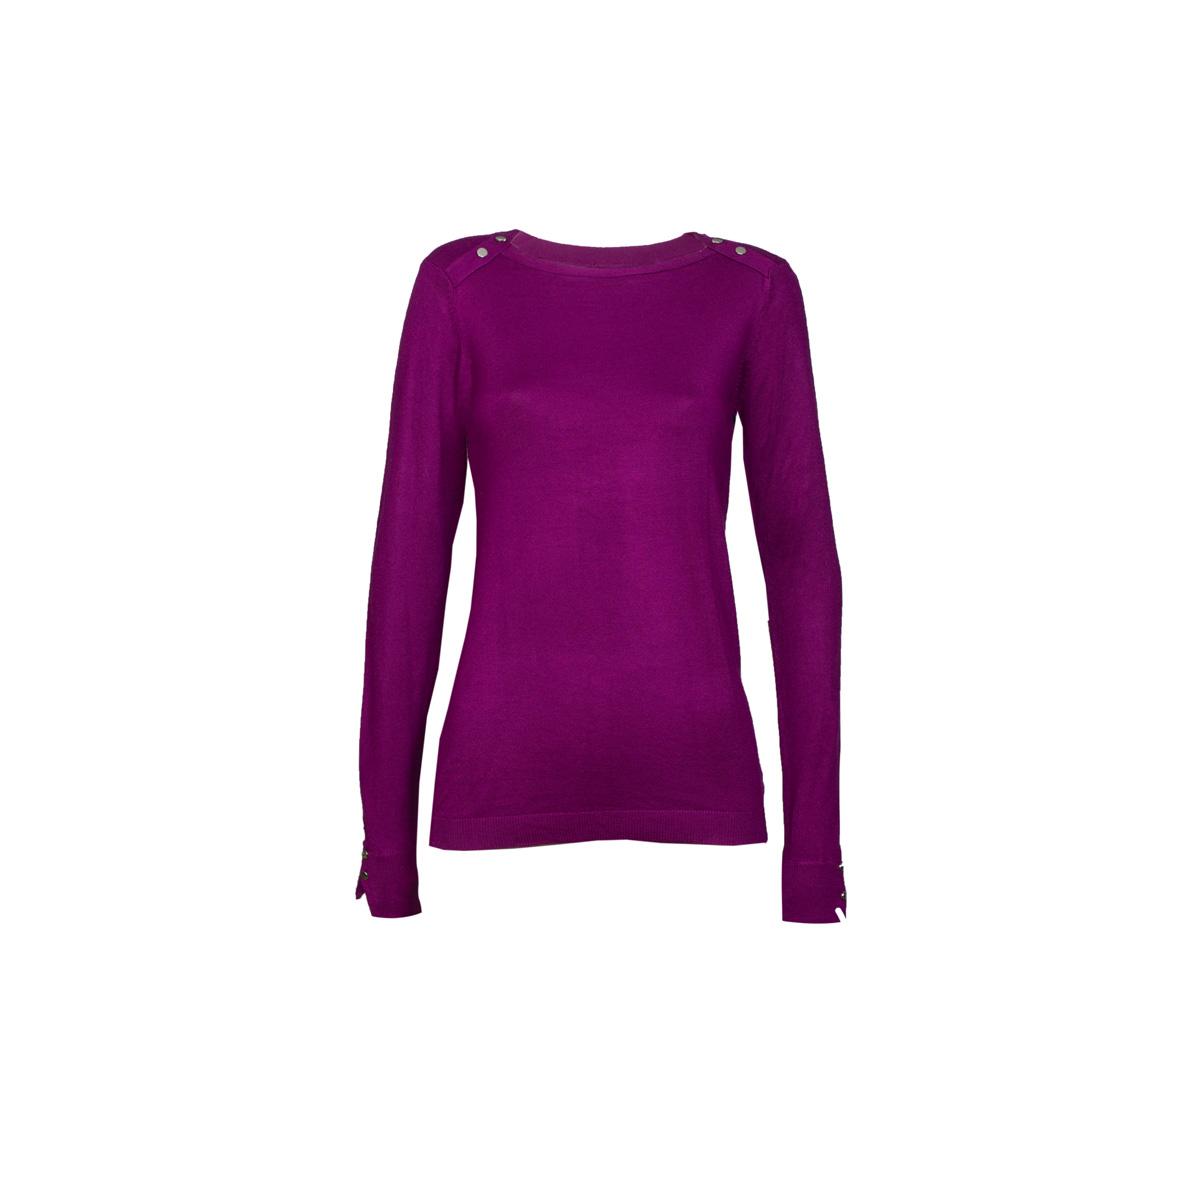 Ženski pulover, temno roza